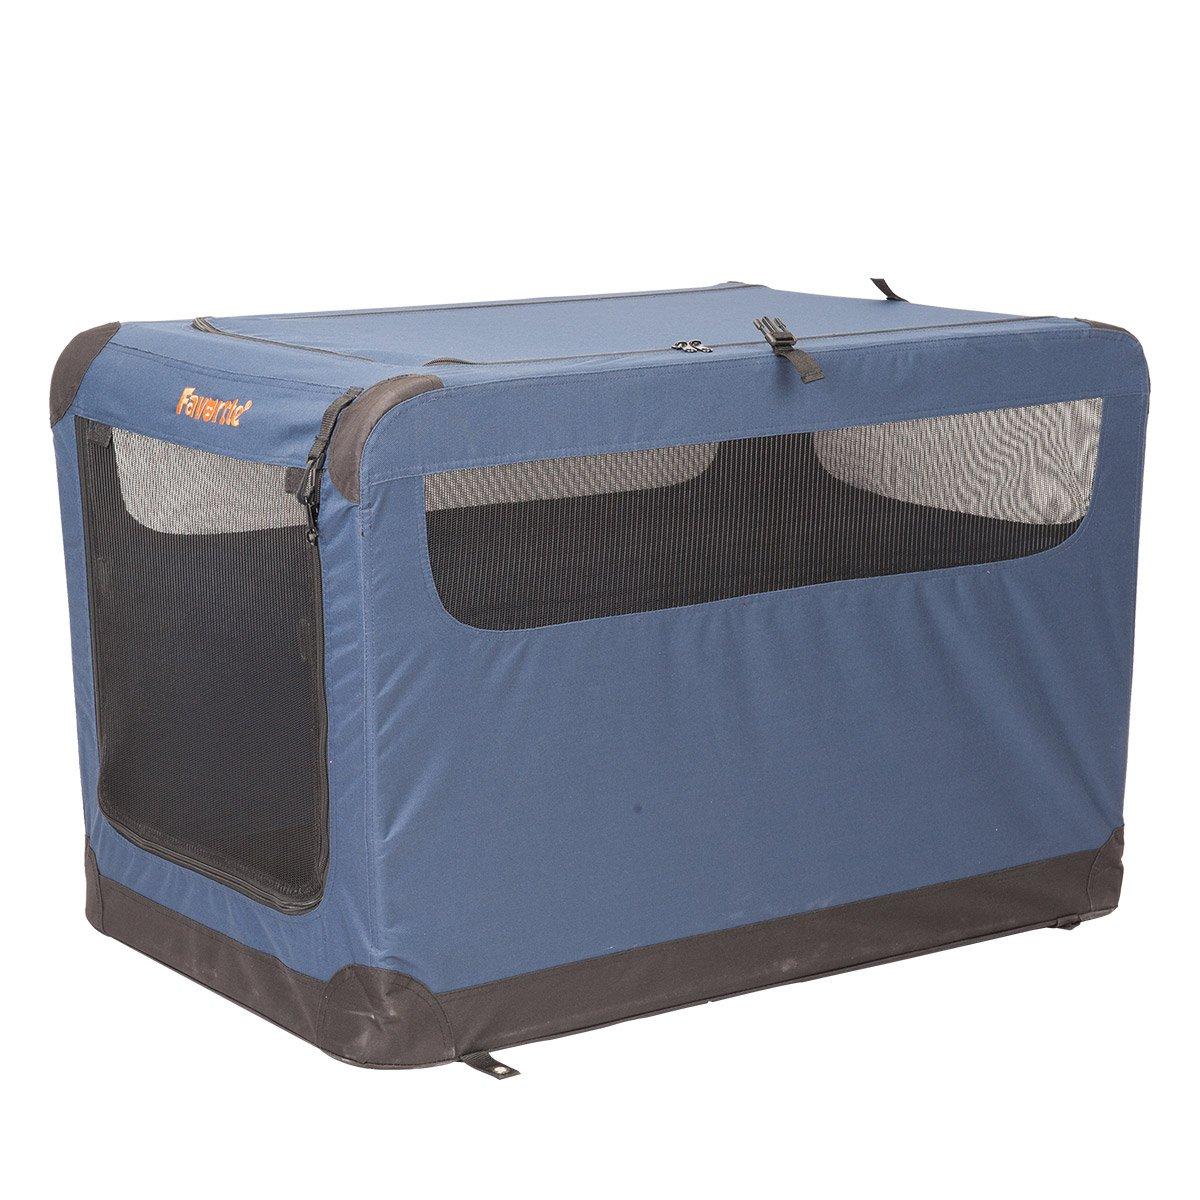 Favorite 36'' Soft Sided Pet Carrier, 2 Doors, Indoor Outdoor Dog Kennel, Travel Vet Visit Collapsible Soft Dog Crate